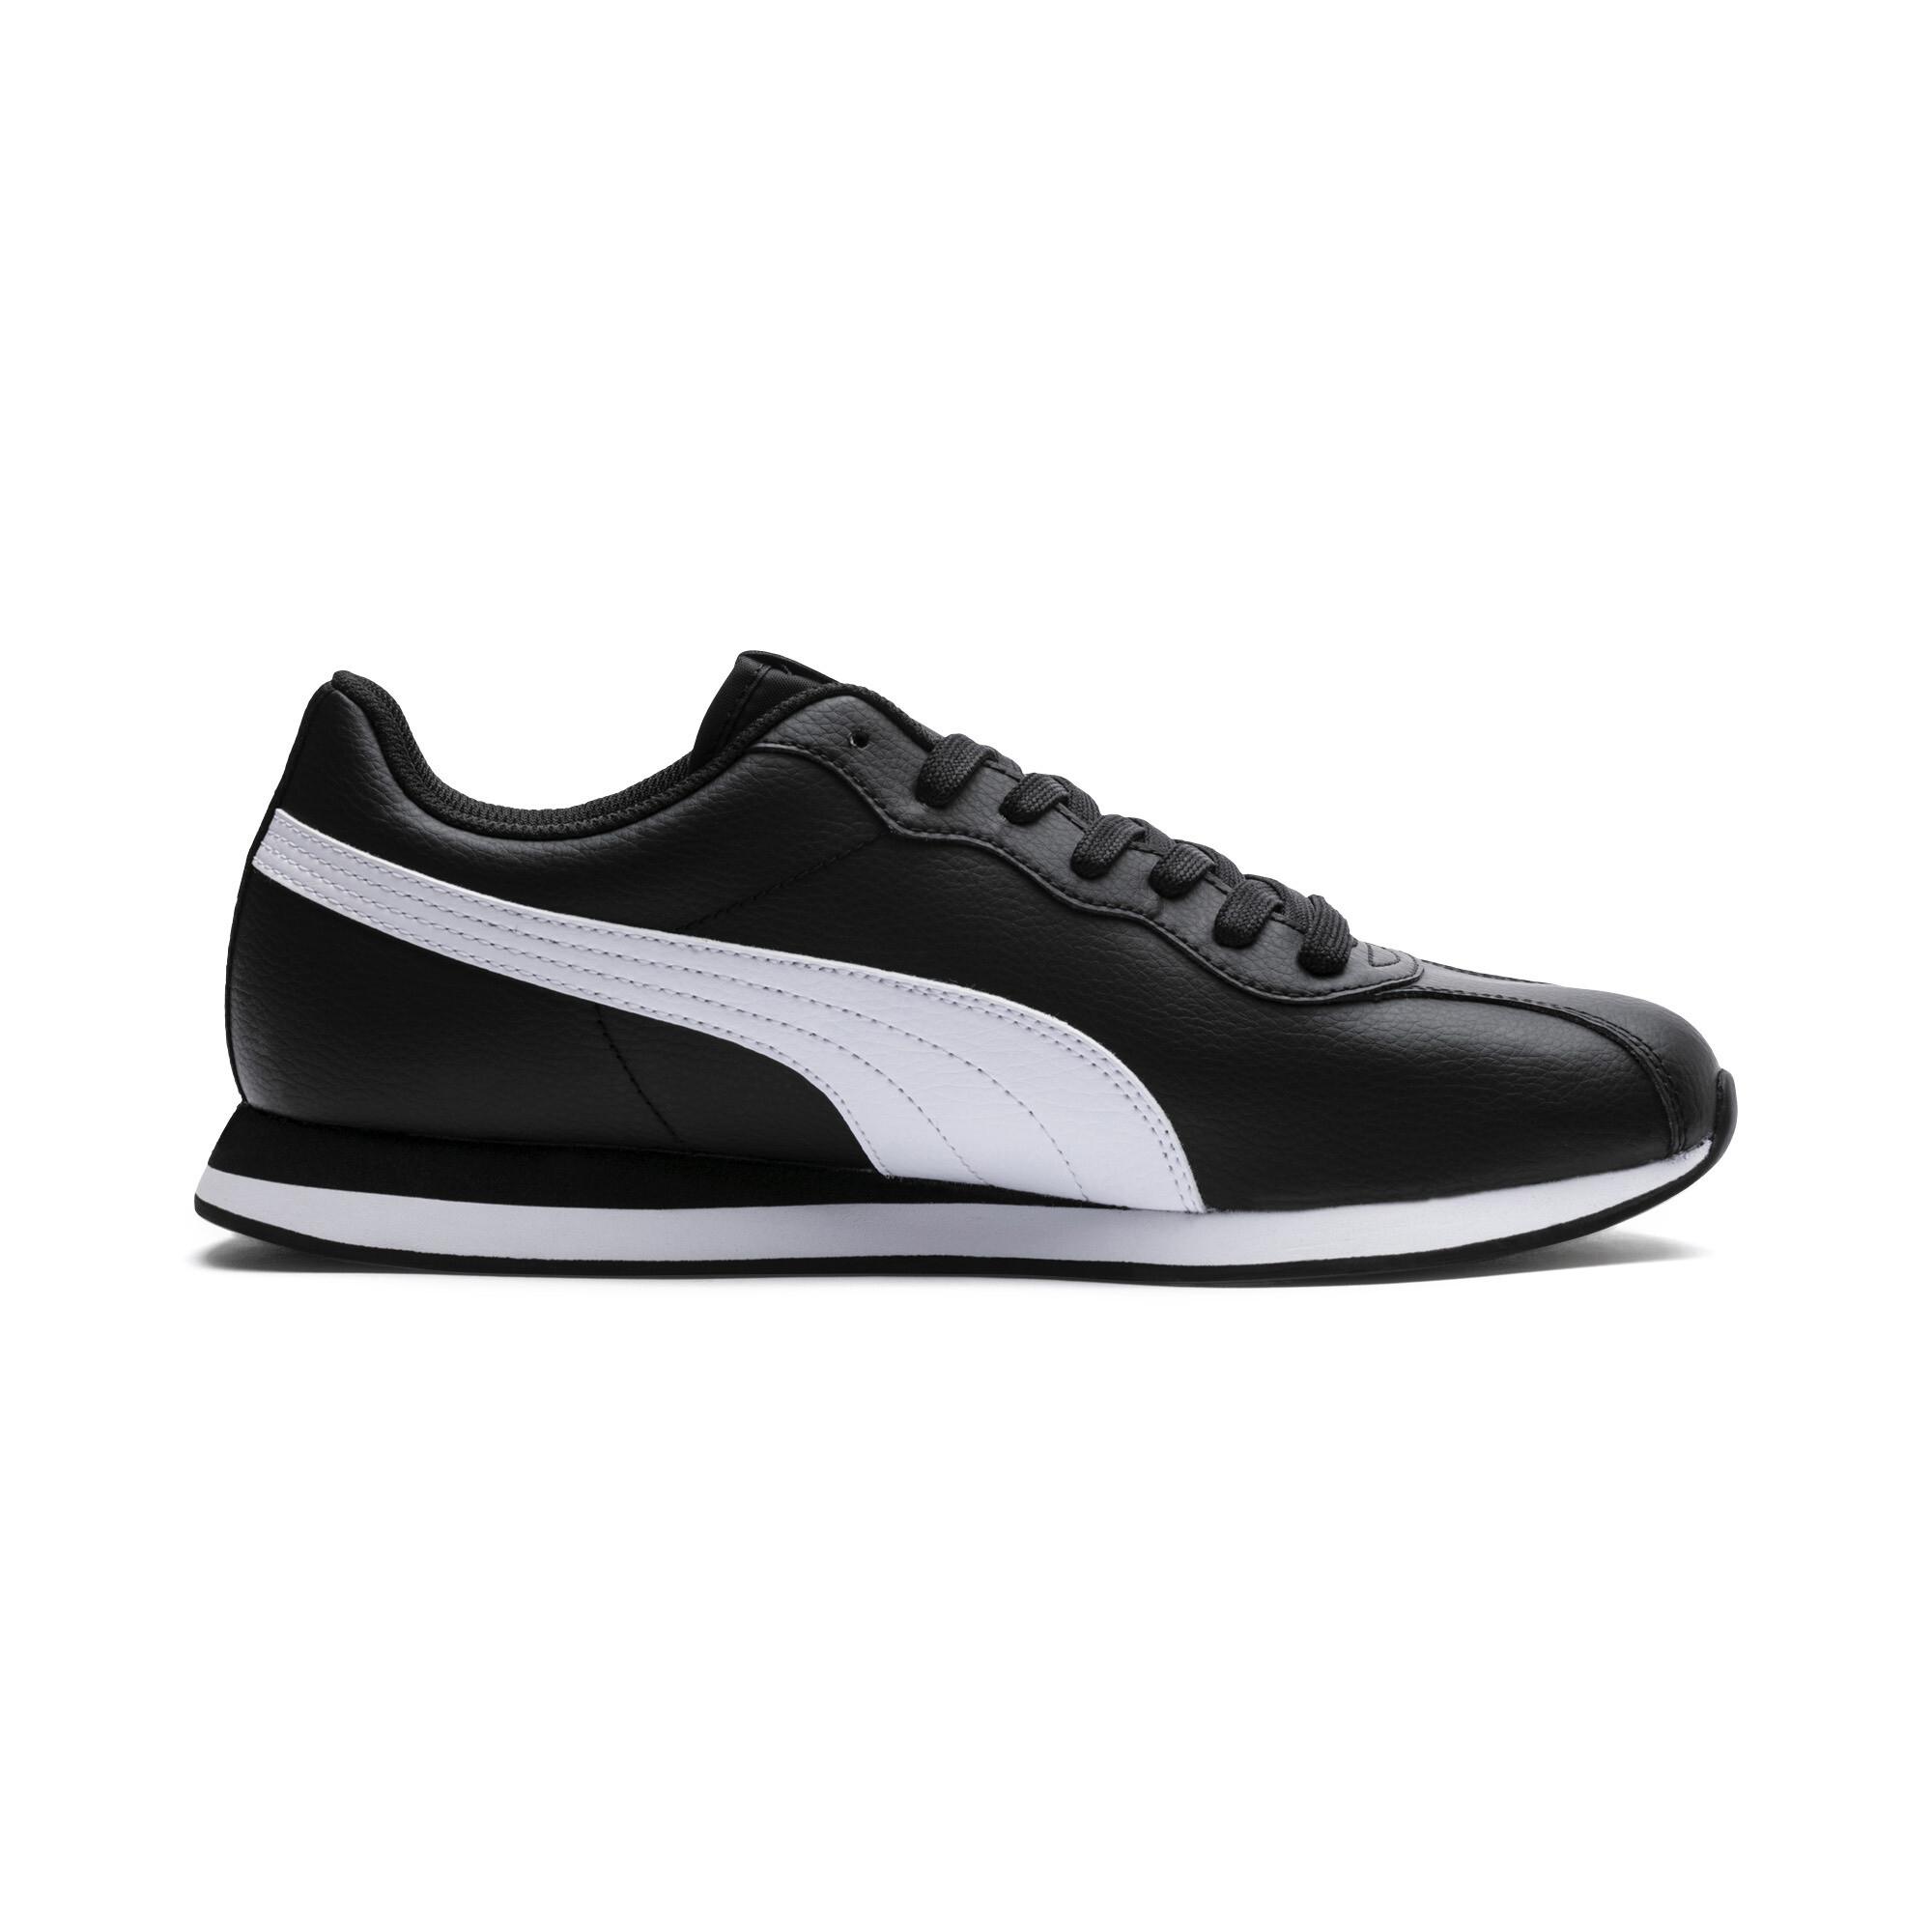 PUMA-Men-039-s-Turin-II-Sneakers thumbnail 38